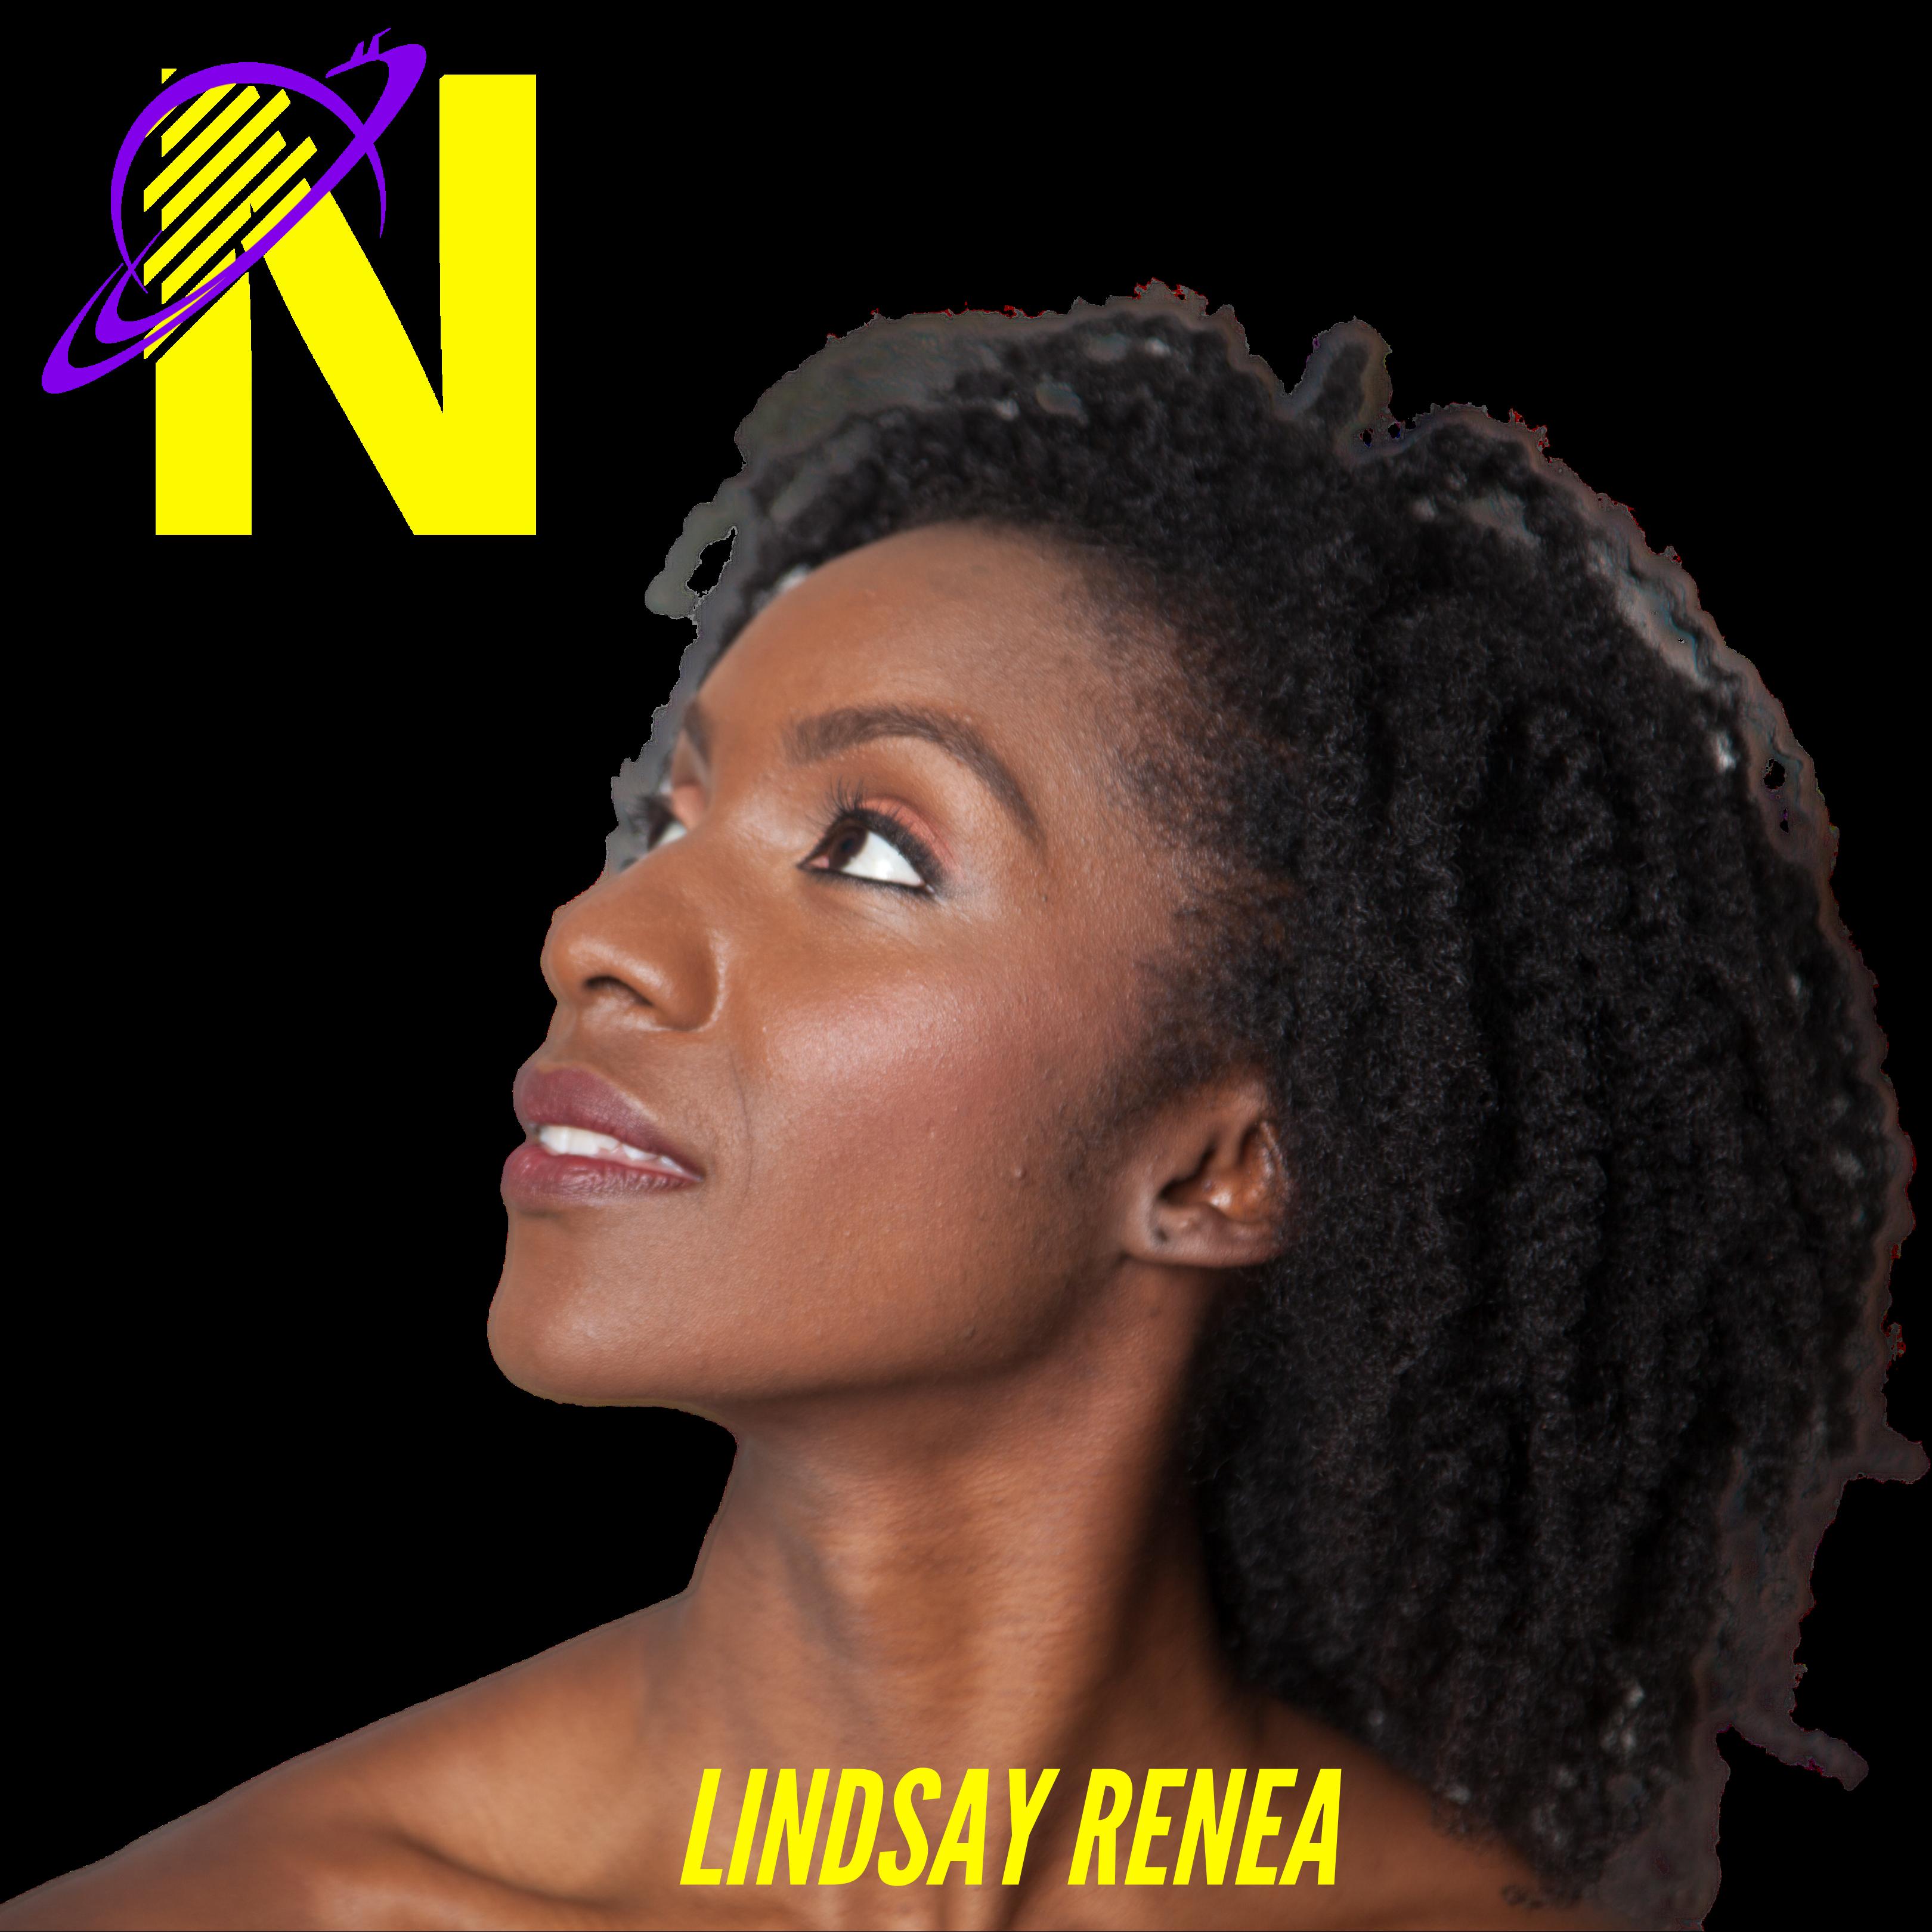 LINDSAY RENEA